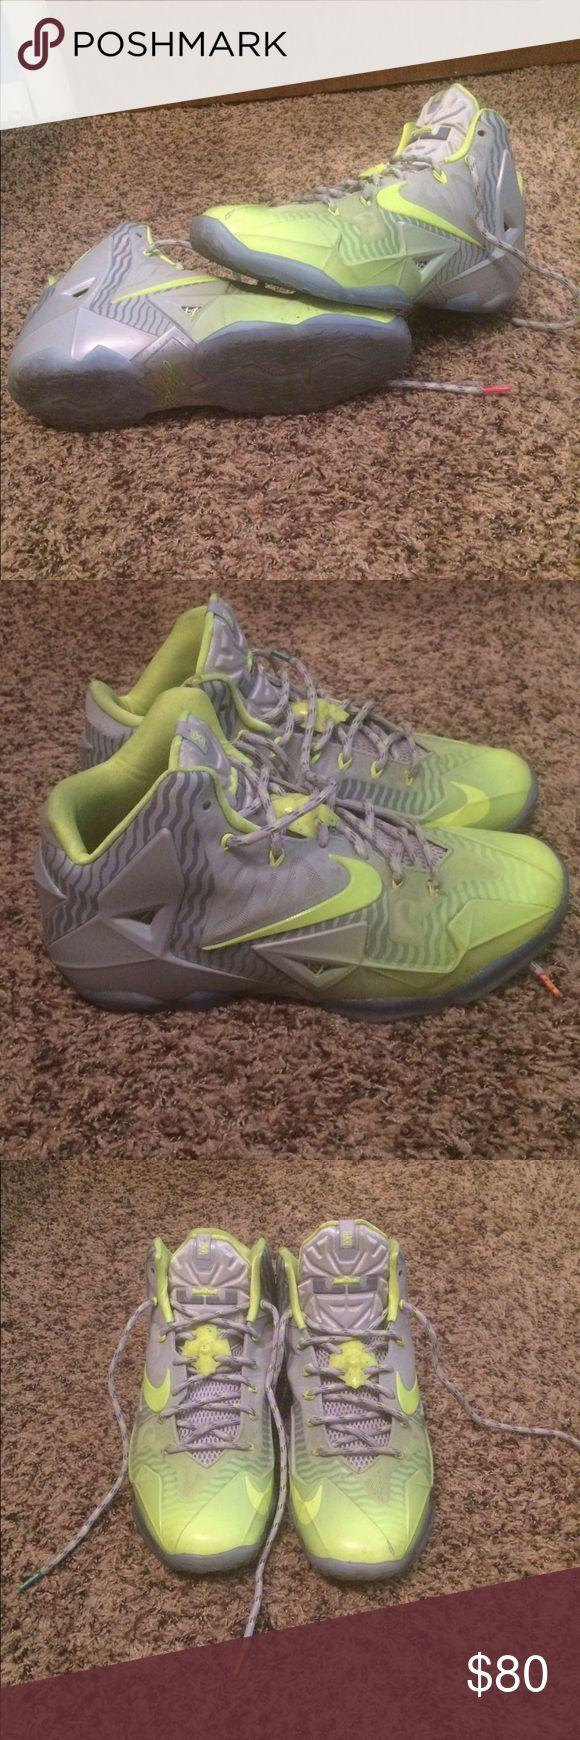 Nike LeBron 11 'Maison du LeBron' Volt-Ice Great condition, light ware. Nike Shoes Athletic Shoes